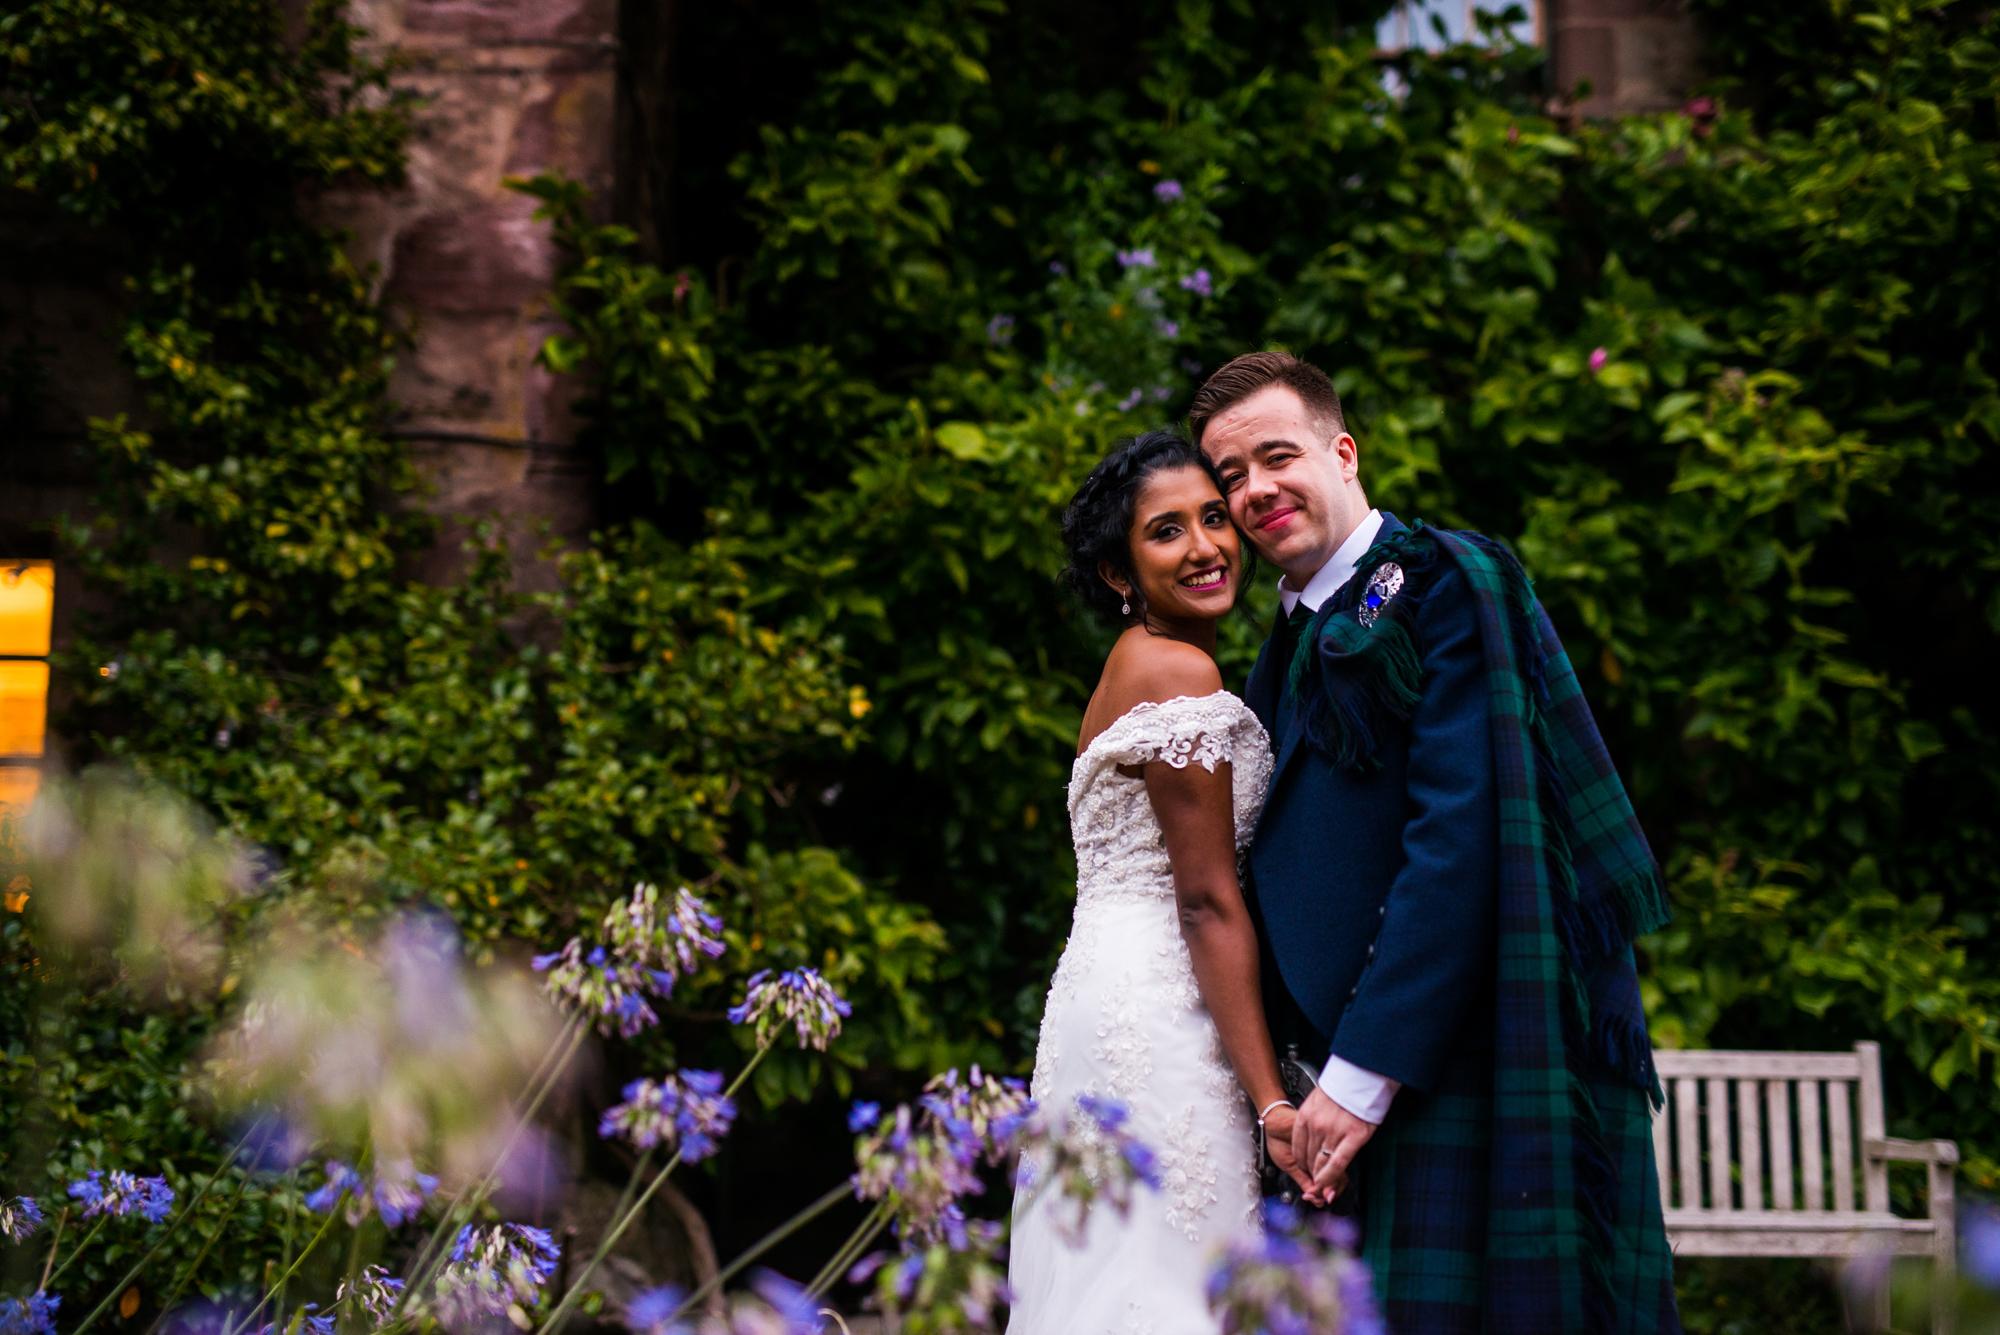 Kev and Shrabani wedding photos (309 of 350).jpg